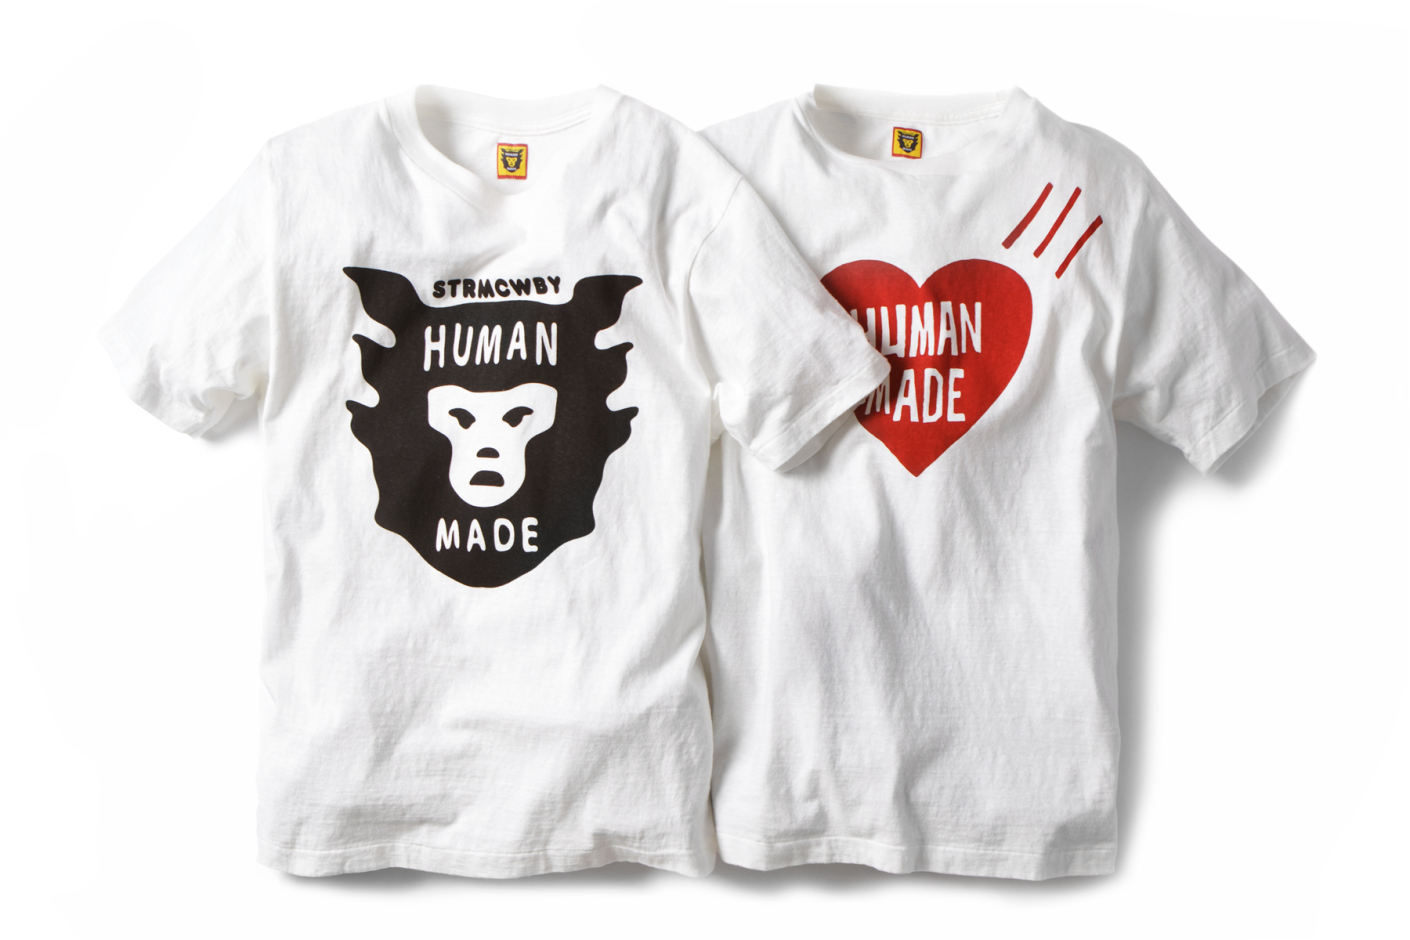 human-made-2014-t-shirt-collection-2